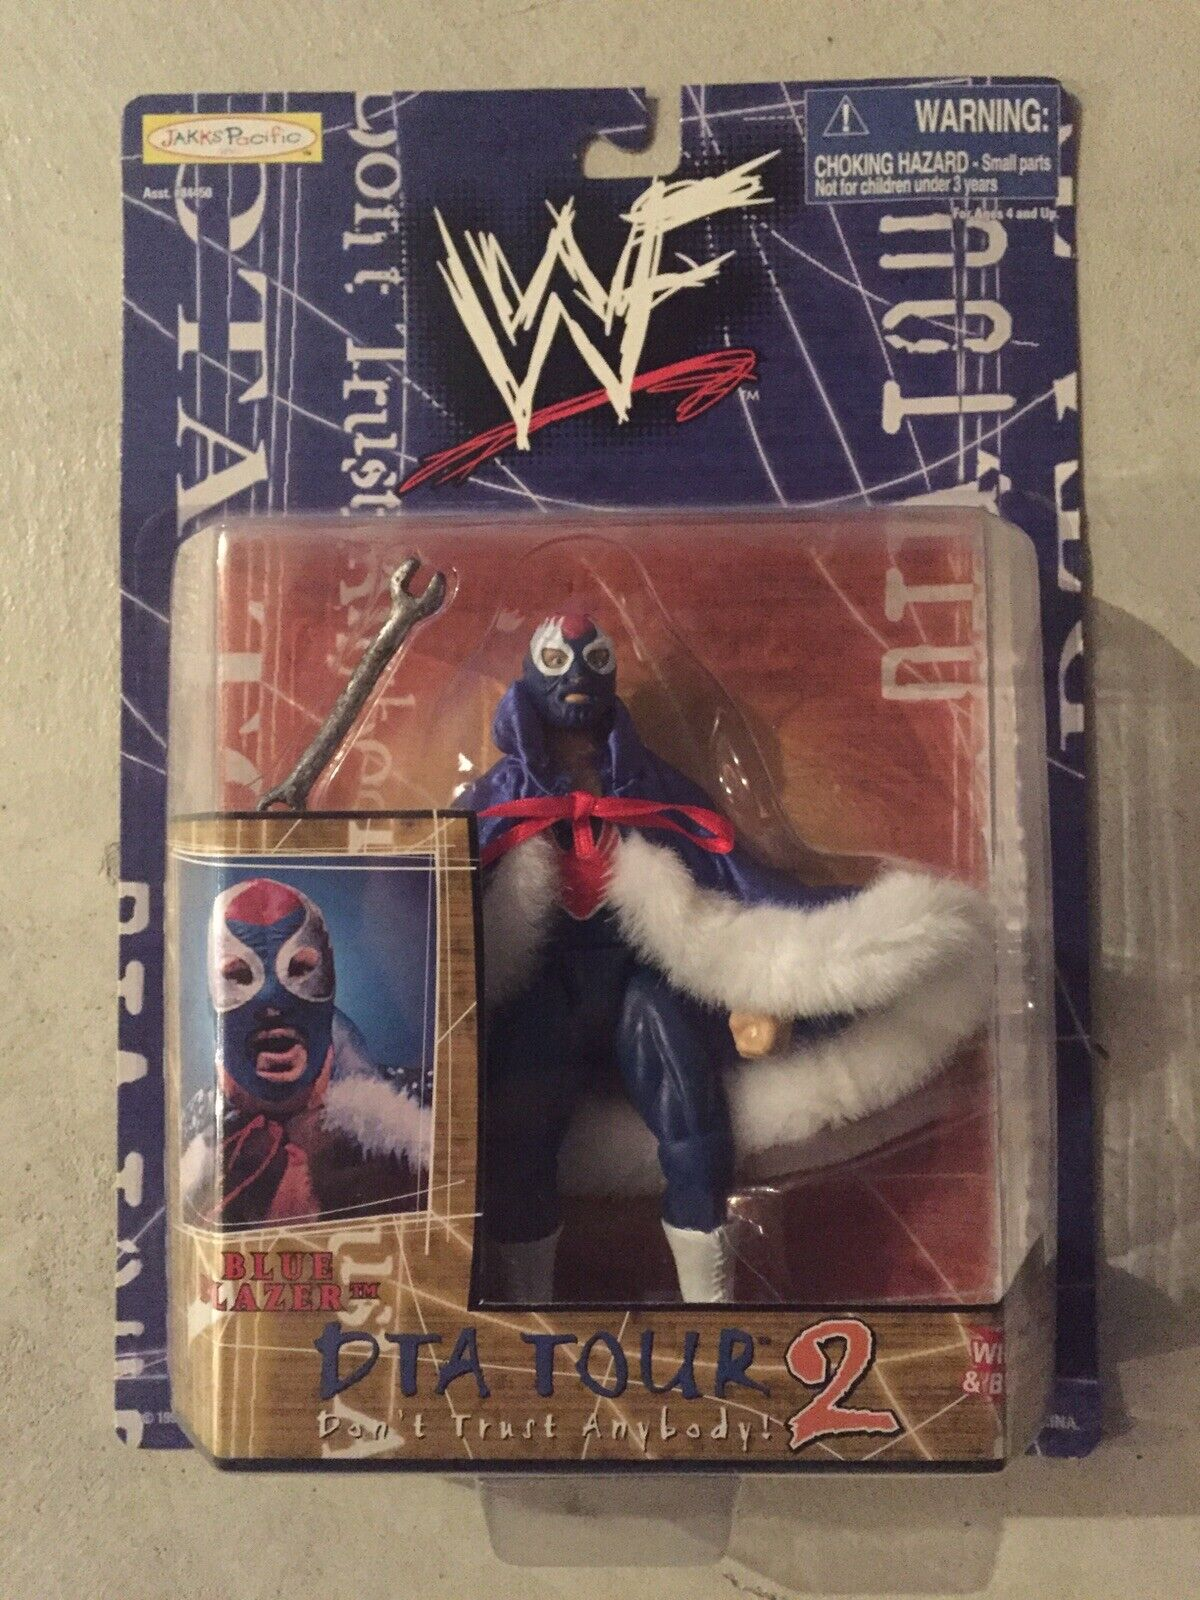 WWE blu Blazer Wrestling azione cifra